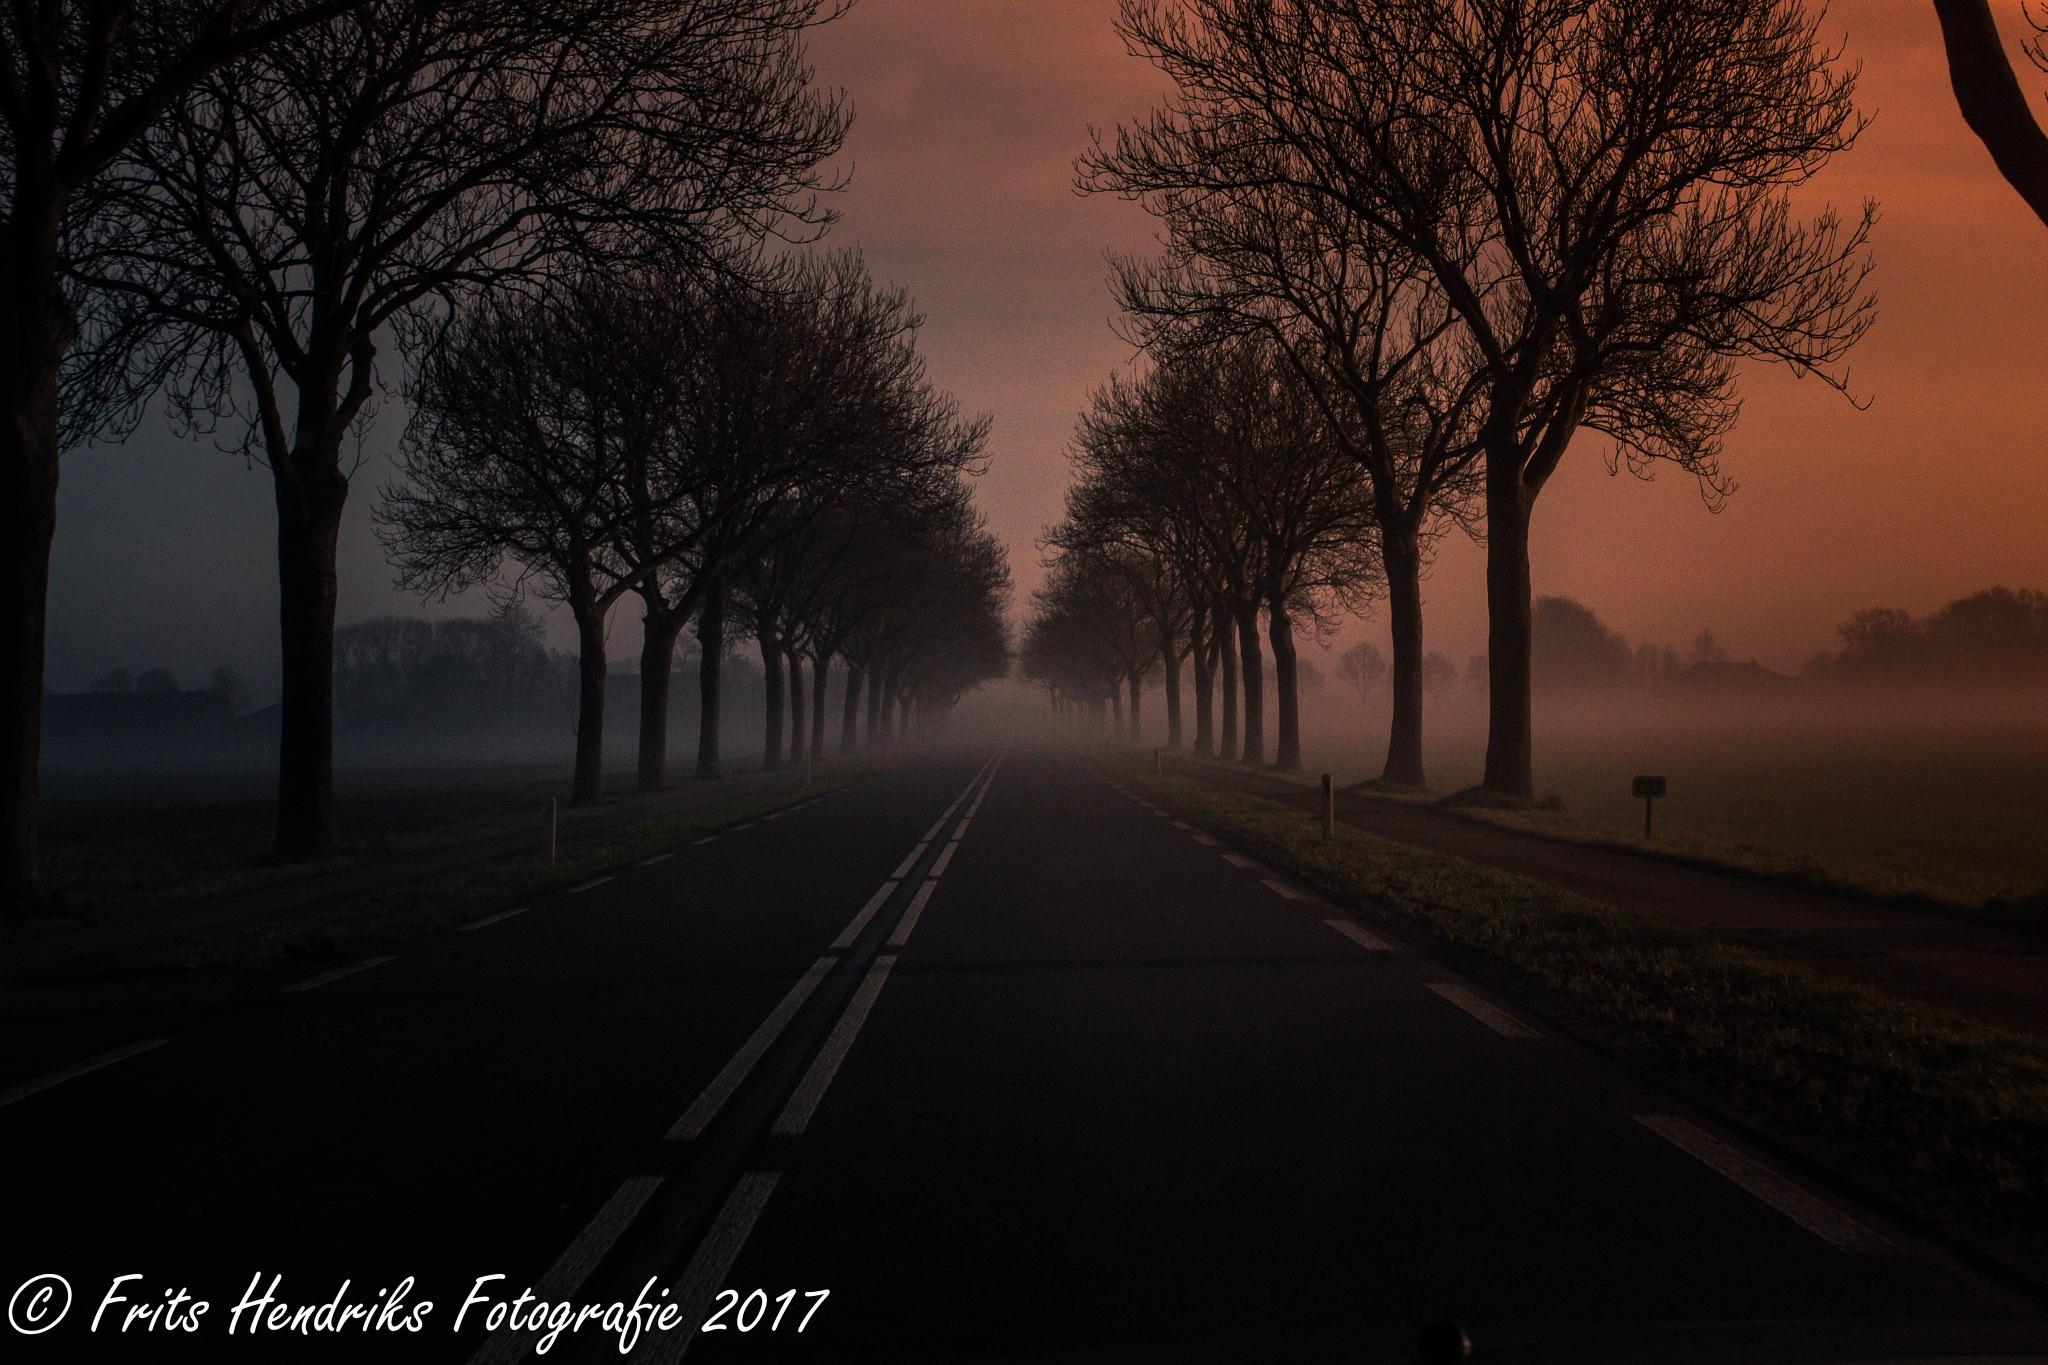 Untitled by fritshendriksfotografie